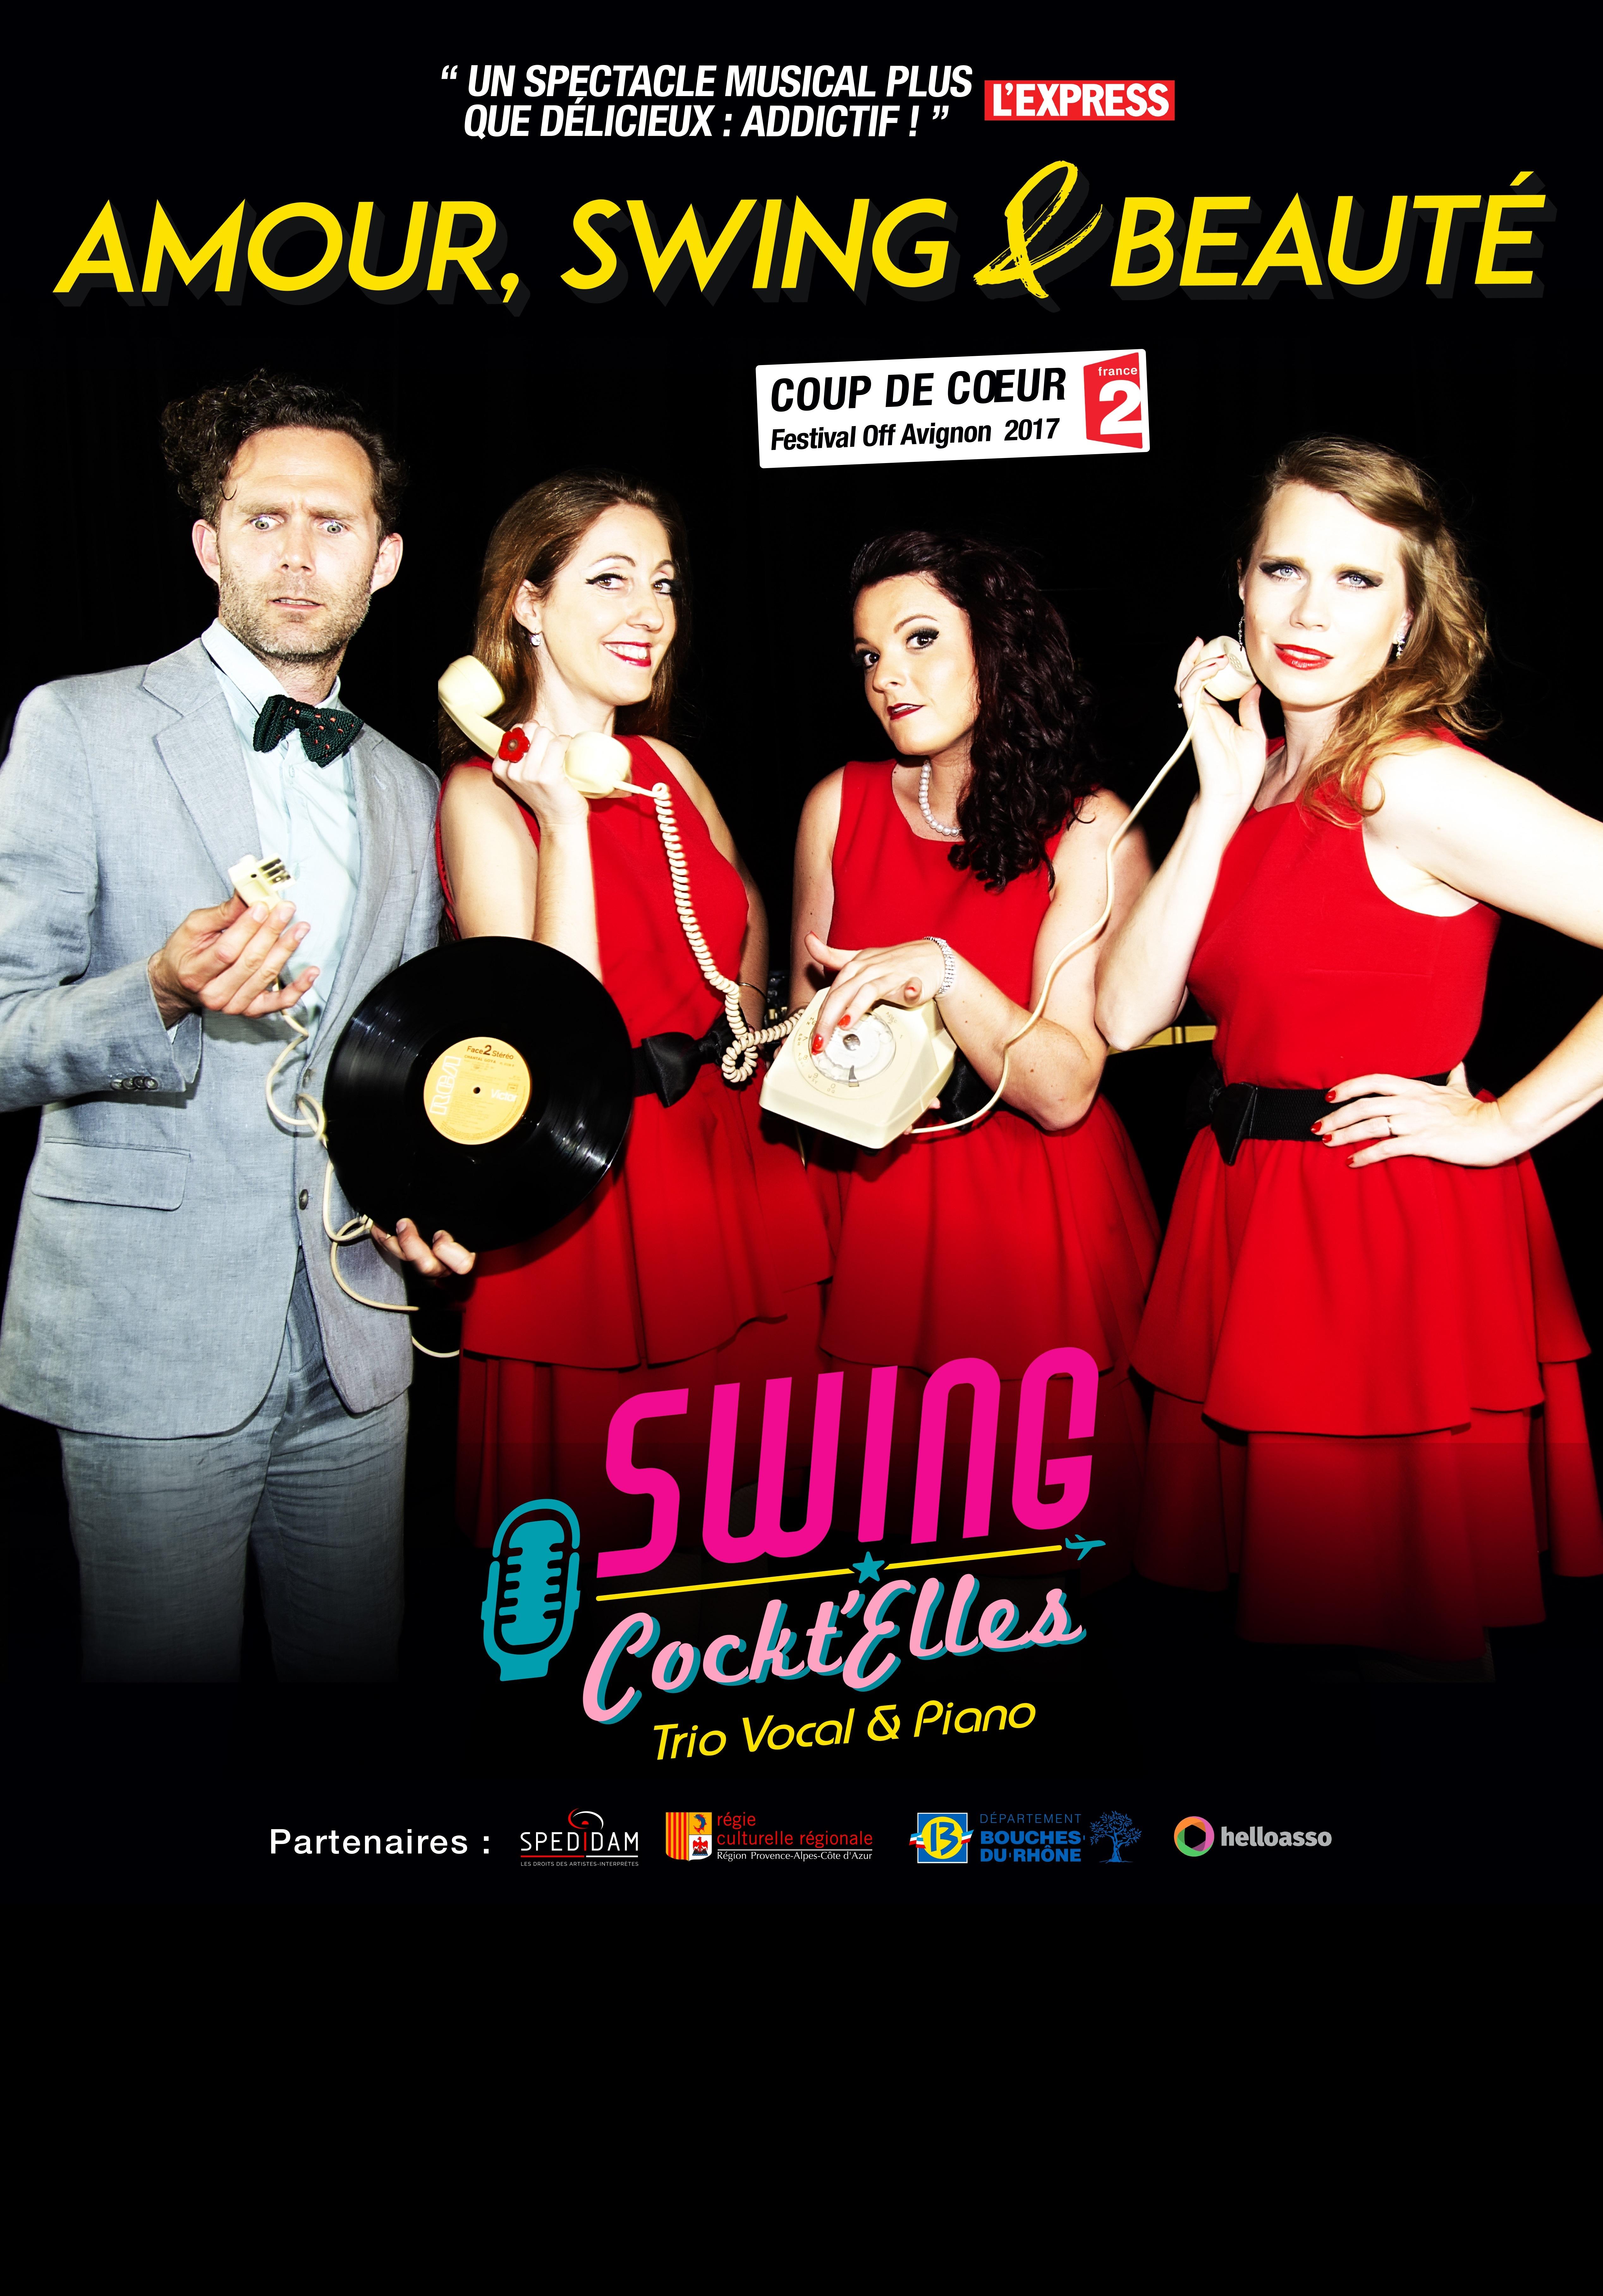 Swing Cockt'elle Humour